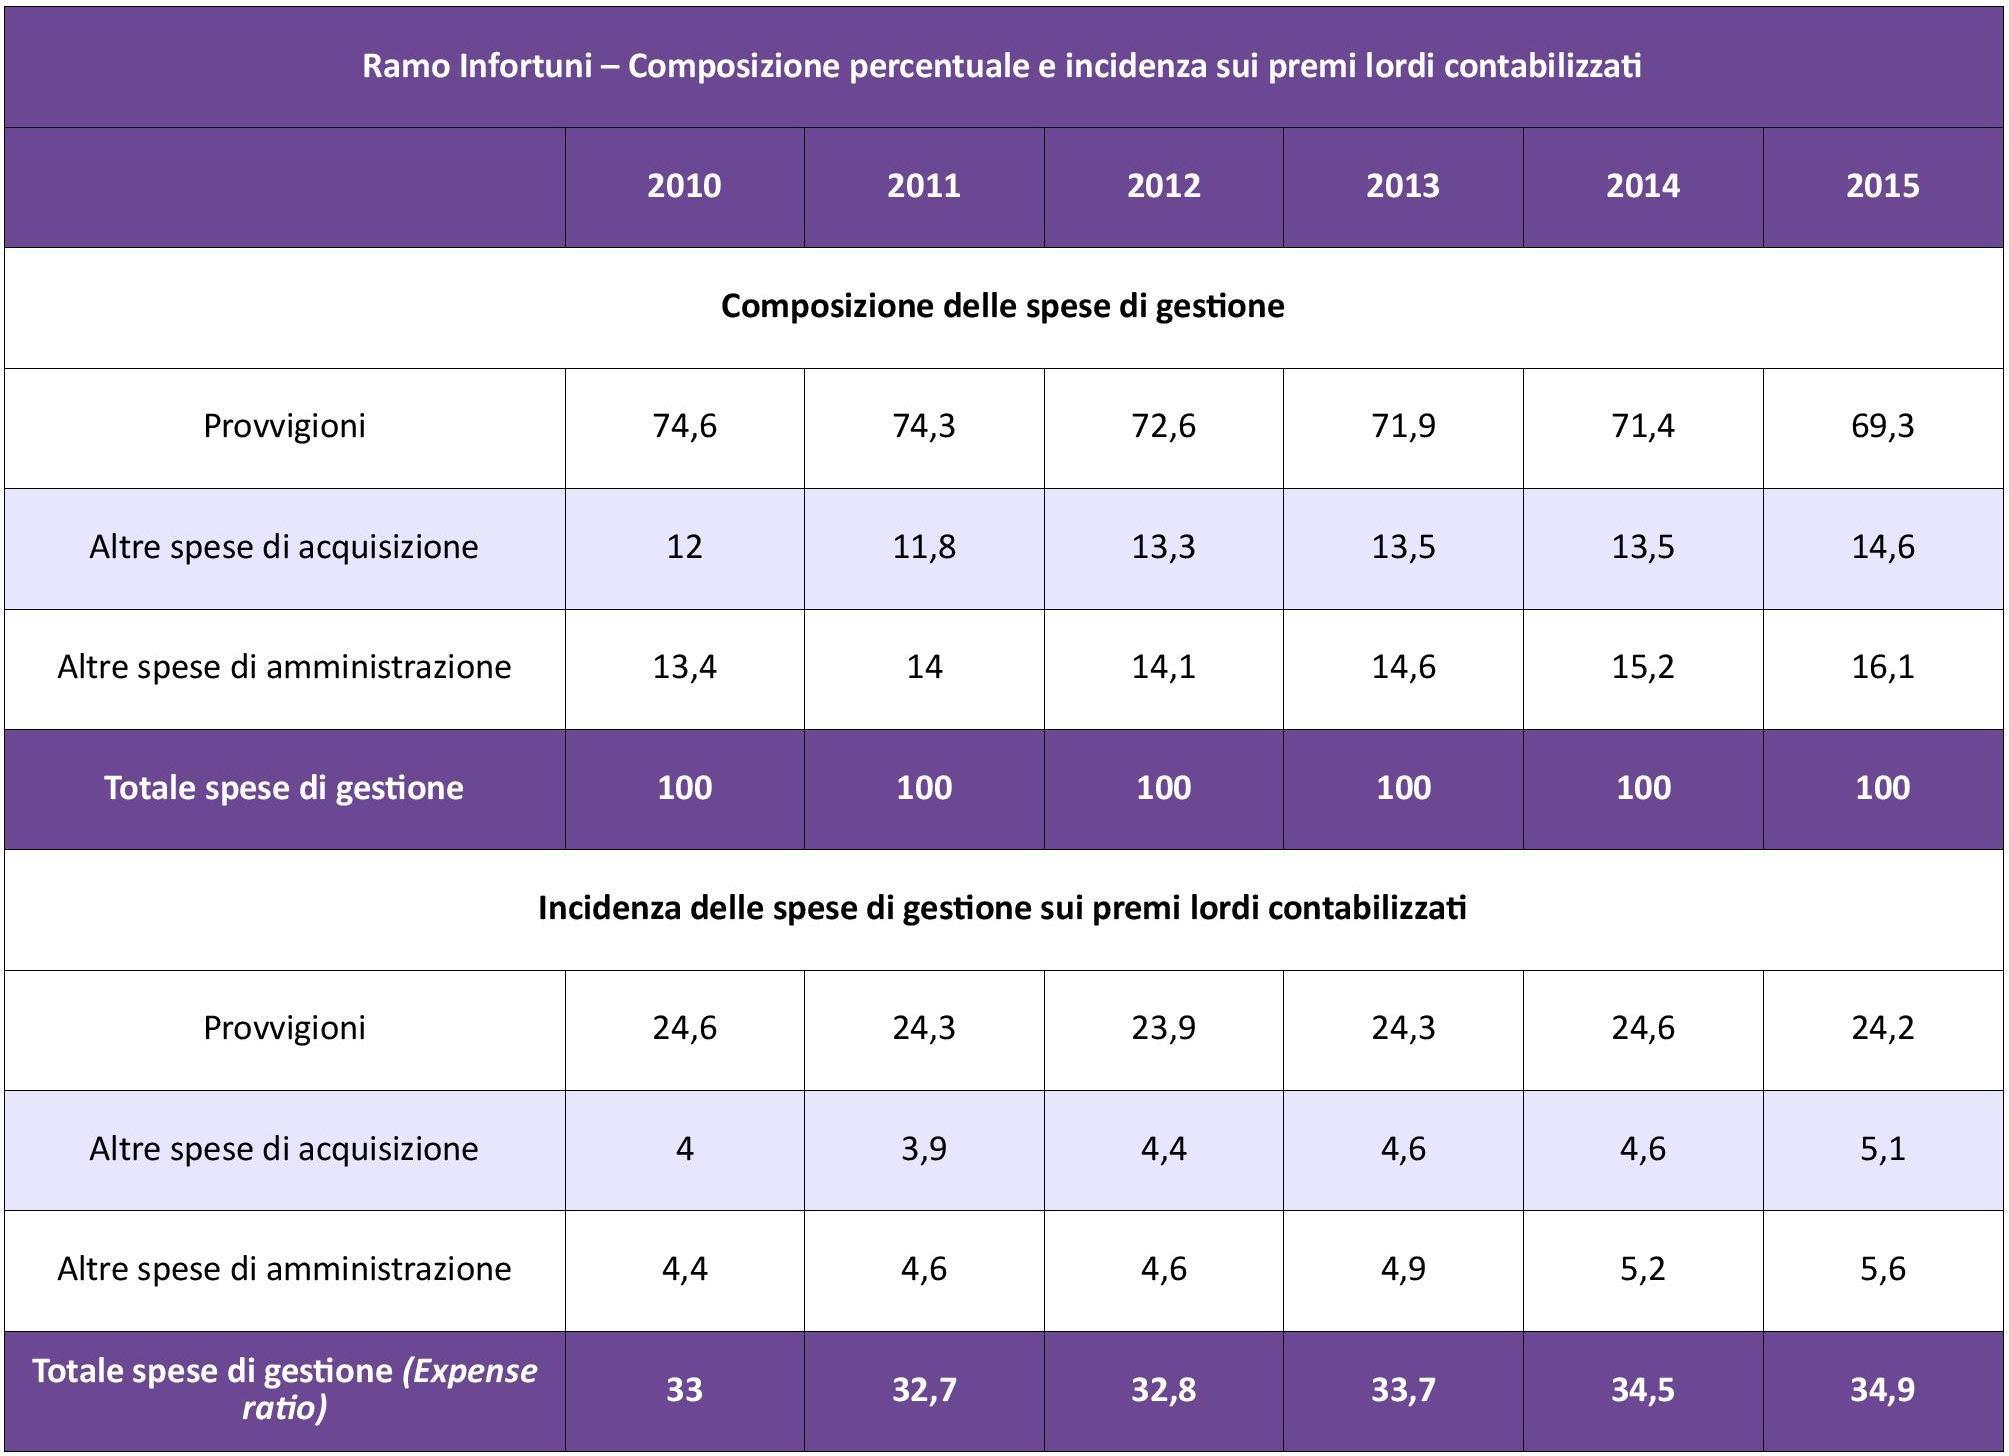 IVASS - Infortuni - Costi Gestione IMC